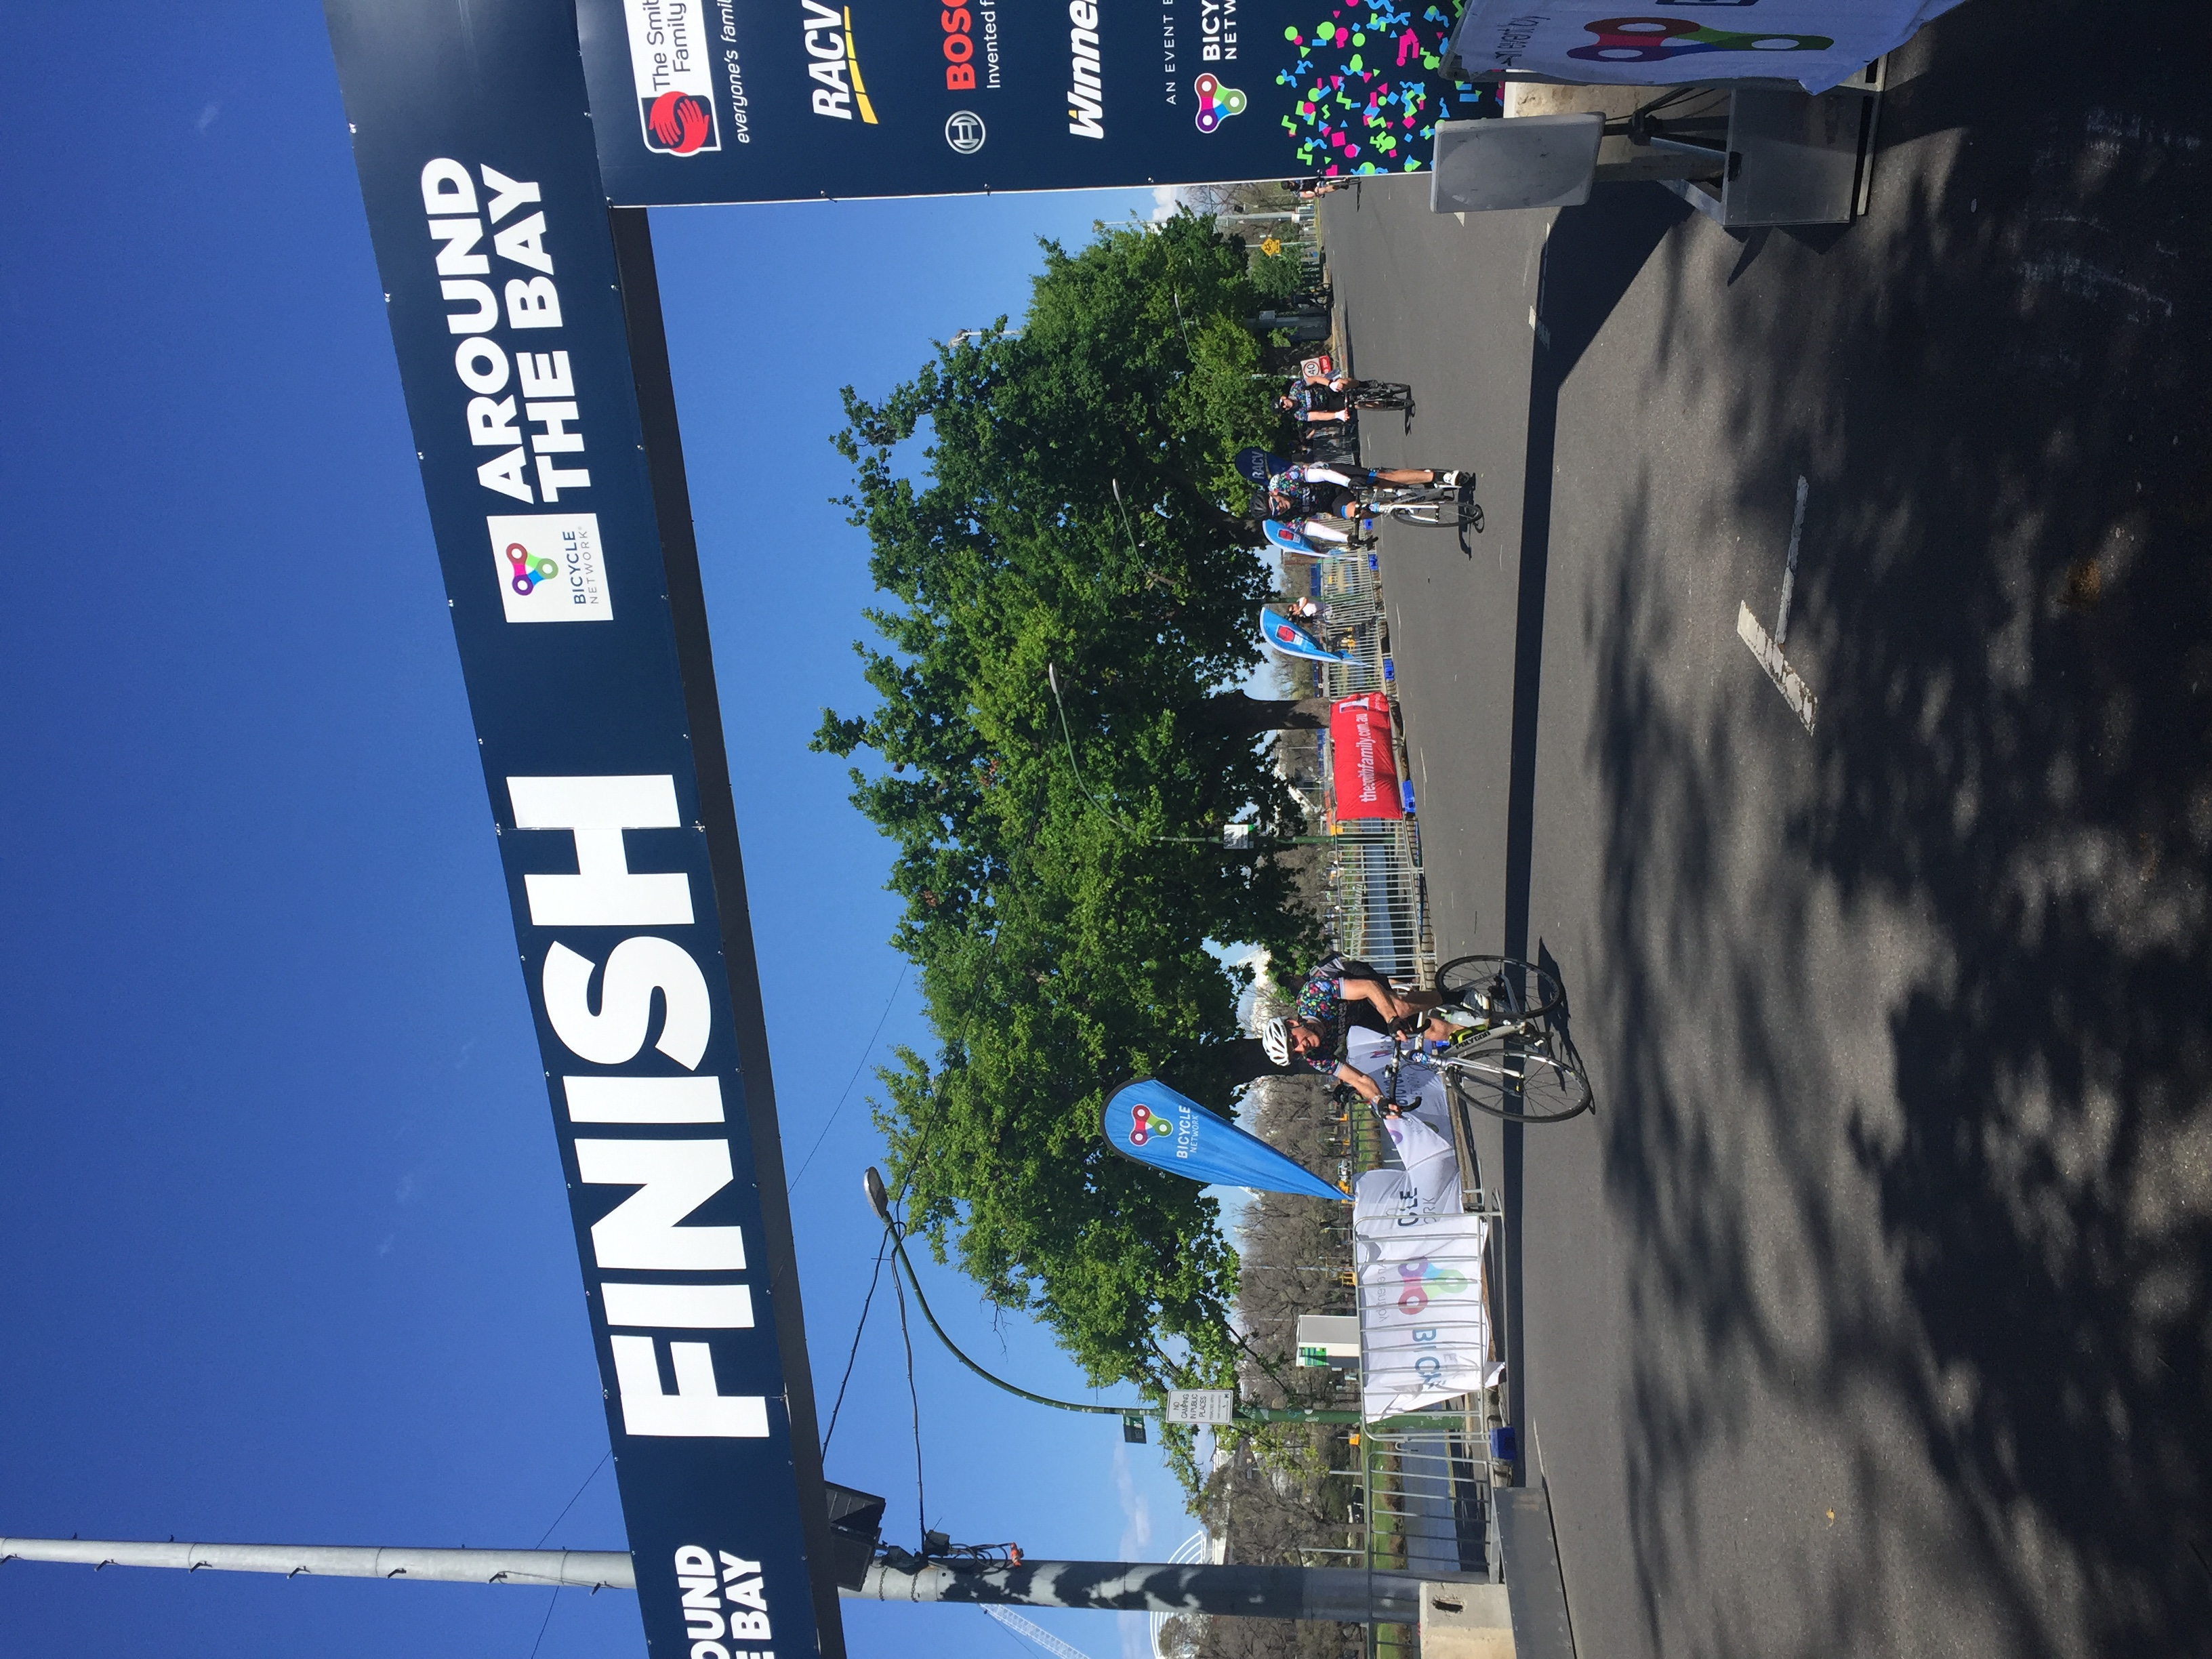 Jim McDonald cycling across the finish line